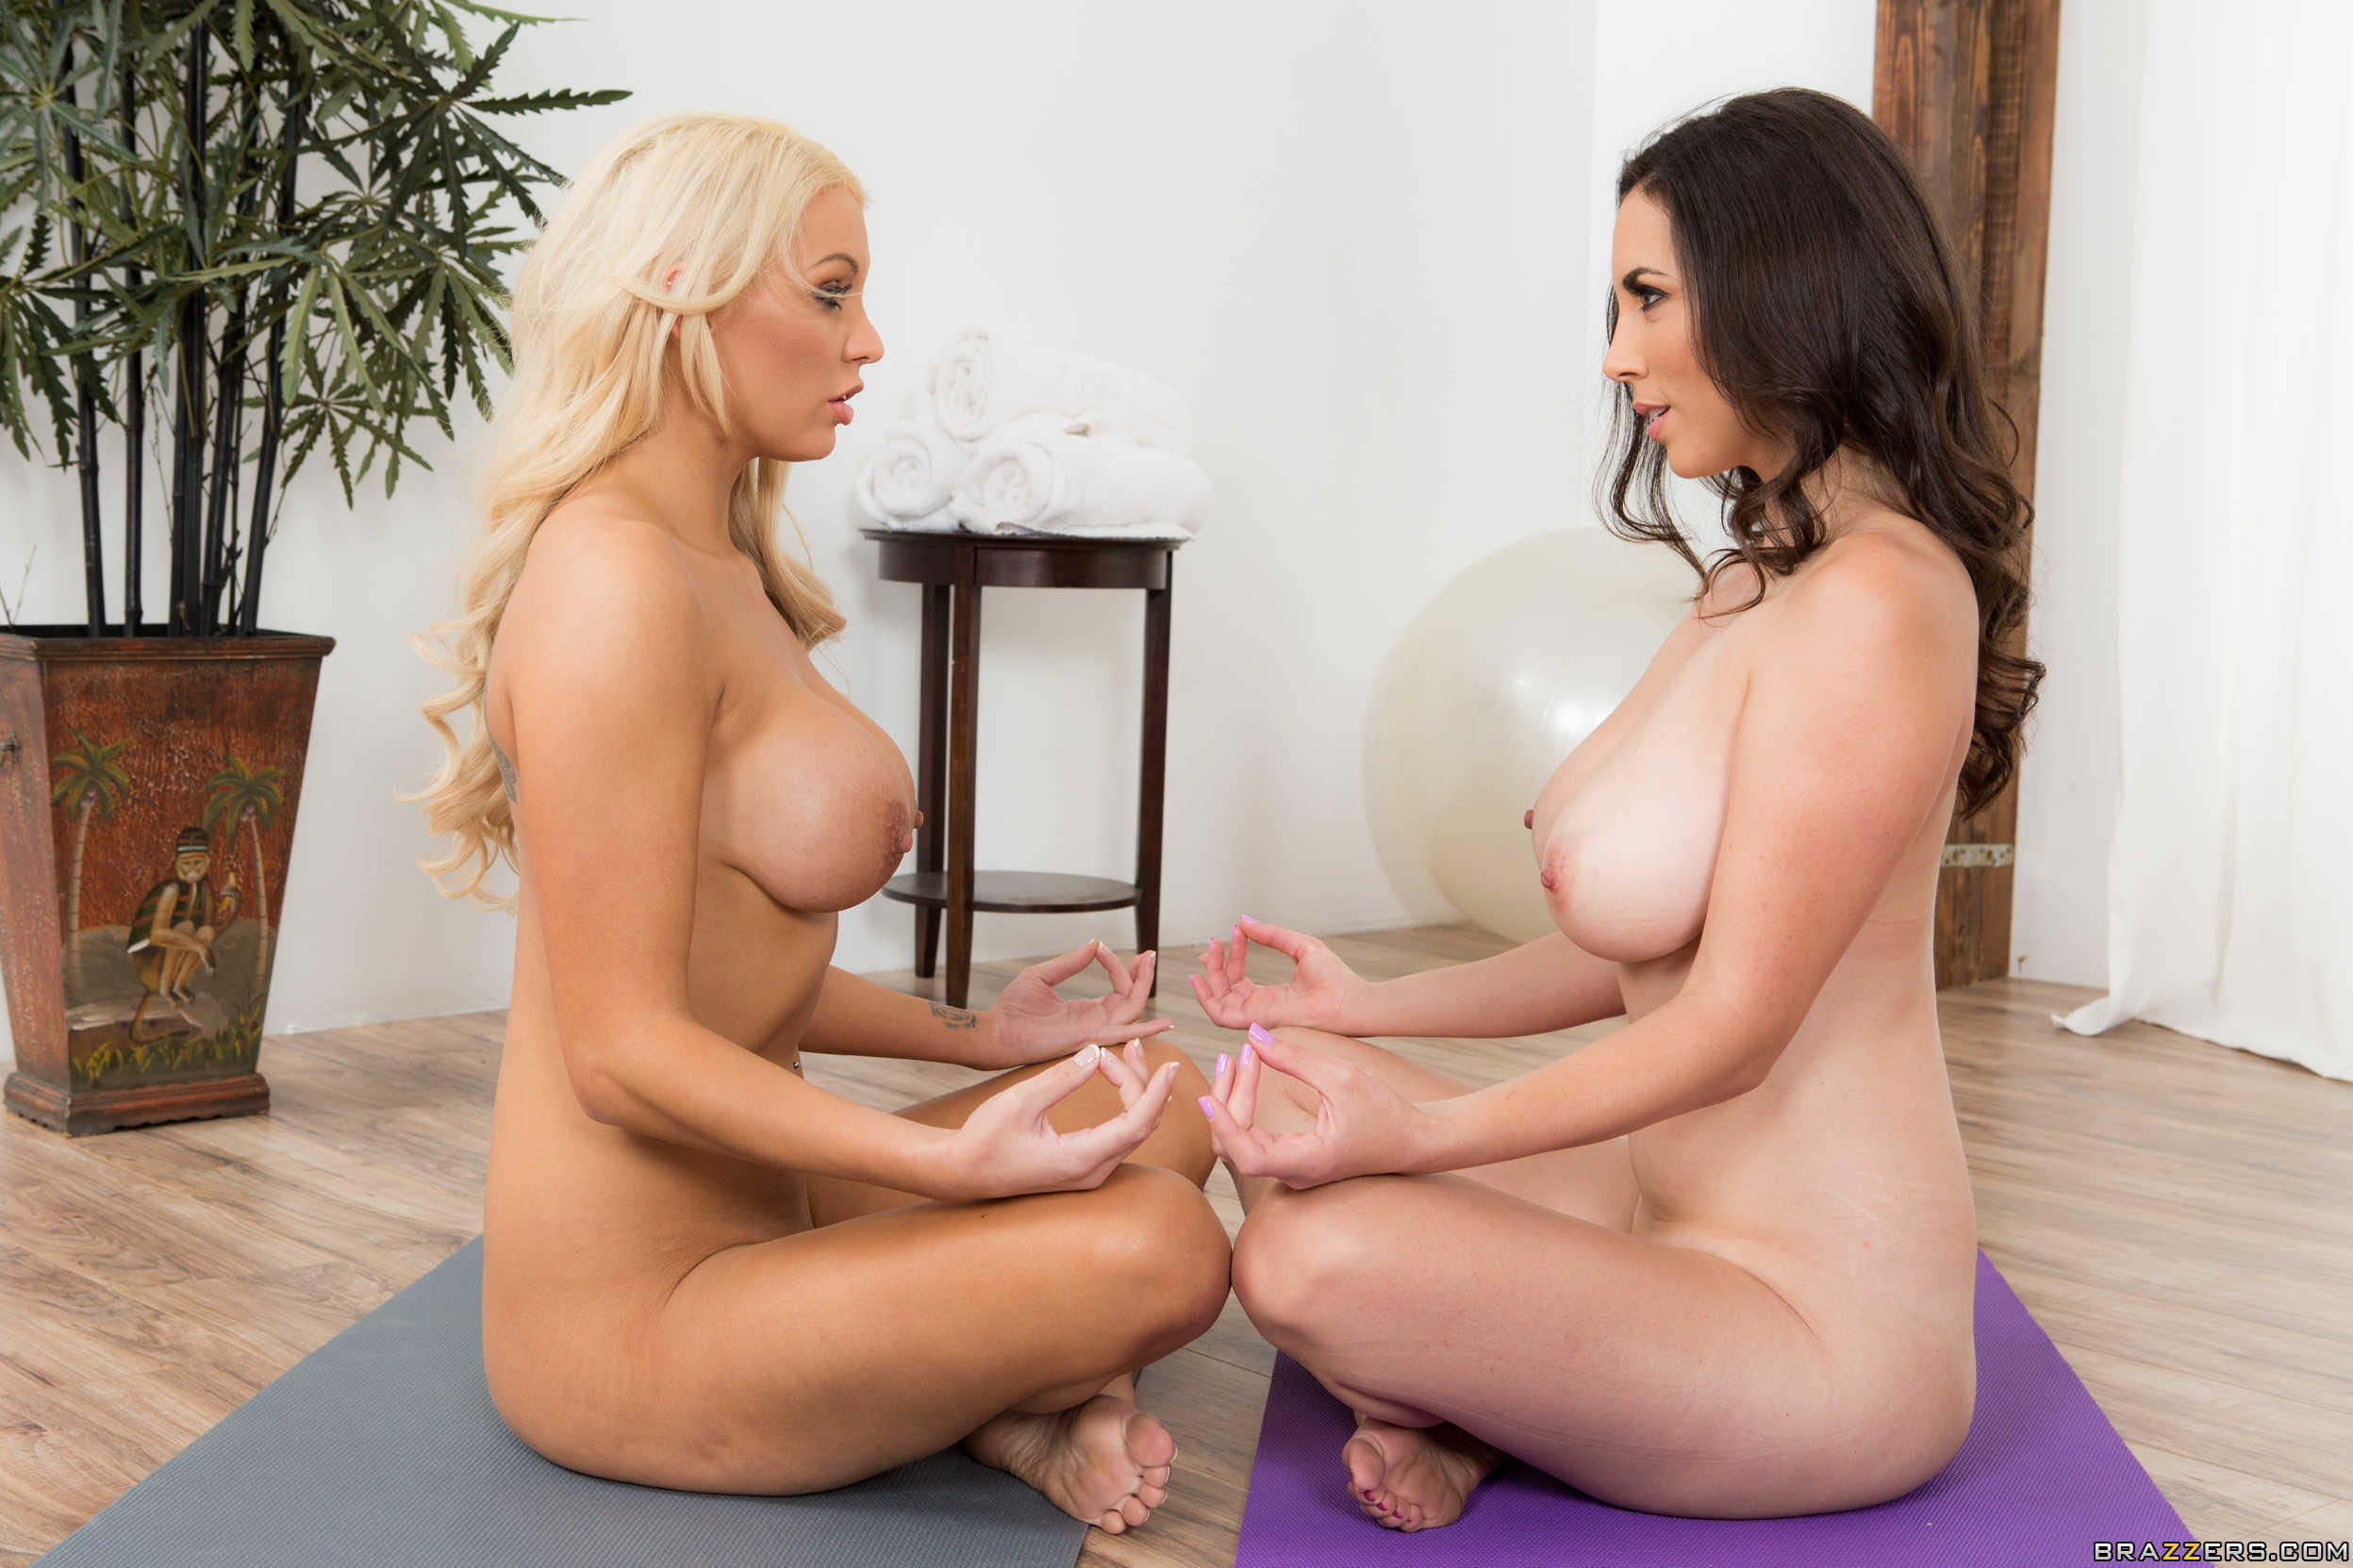 Jelena Jensen y Kenzie Taylor muestran sus conchitas juntas